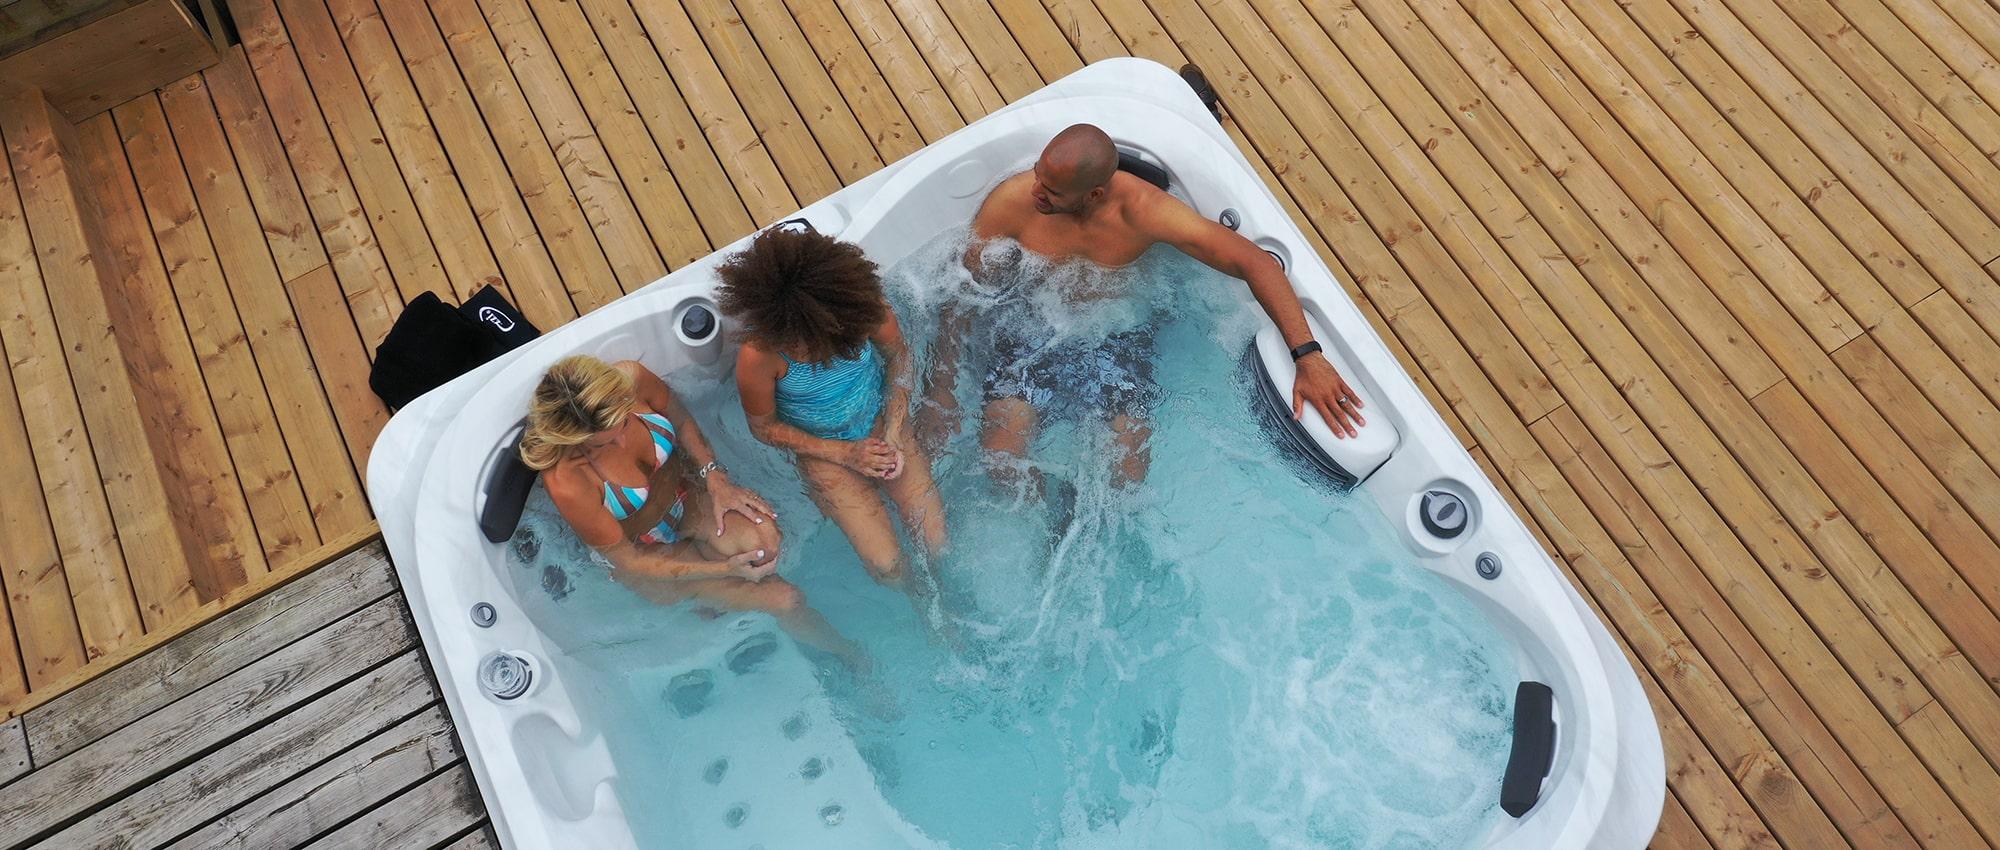 Jacuzzi hot tub backyard friends